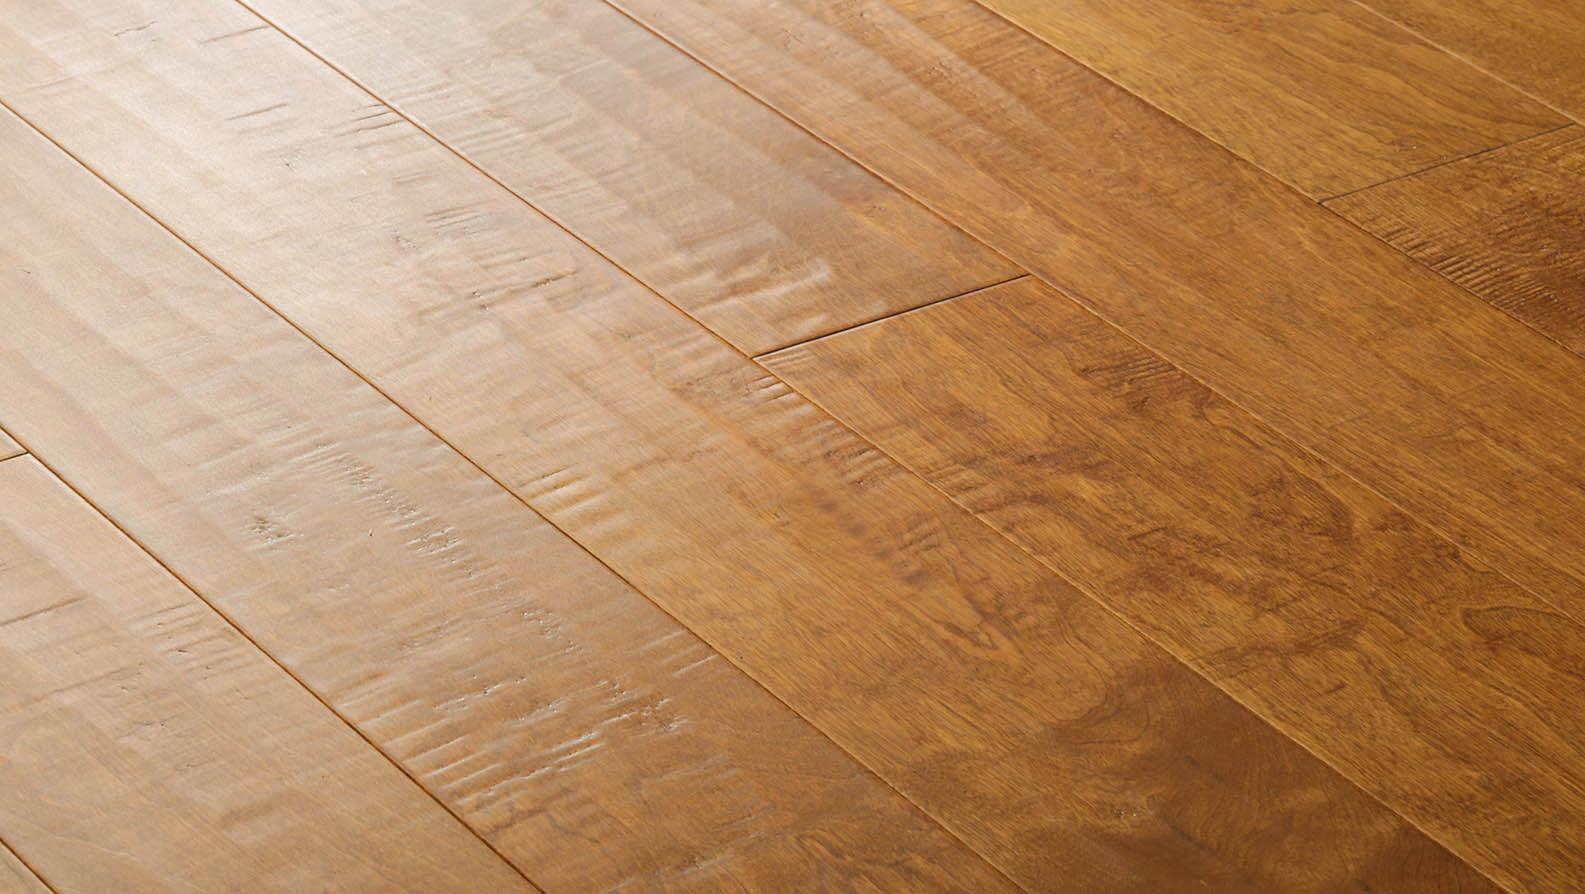 Installing 3 4 Inch Engineered Hardwood Flooring Of Hardwood Flooring Inside 20161101152941 8994